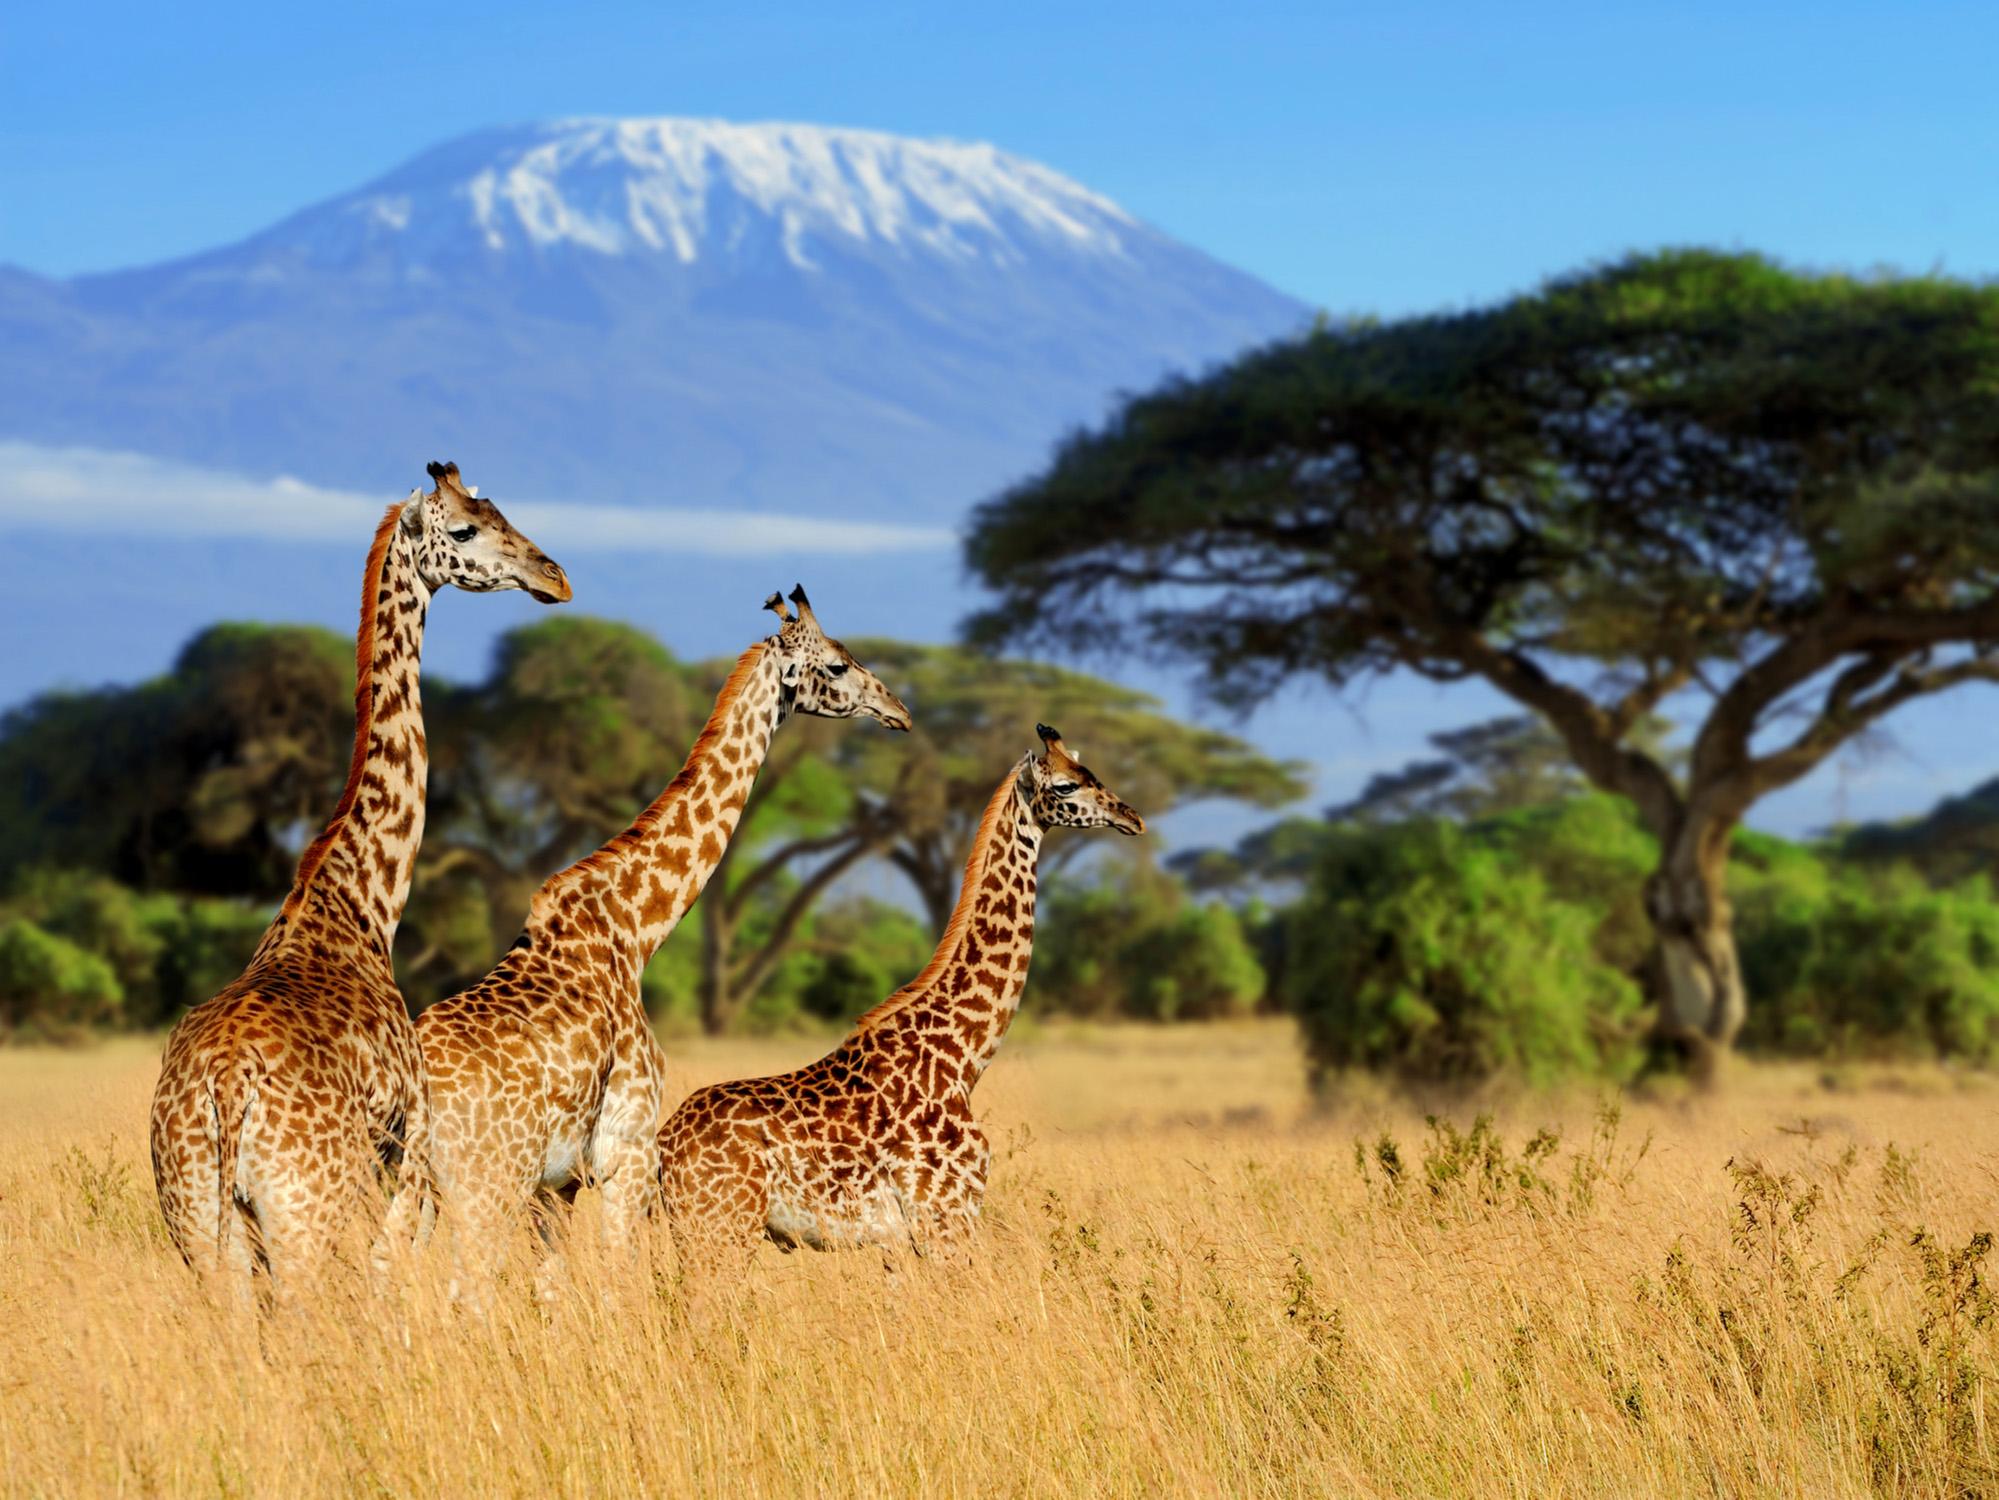 Three giraffes-72 ppi